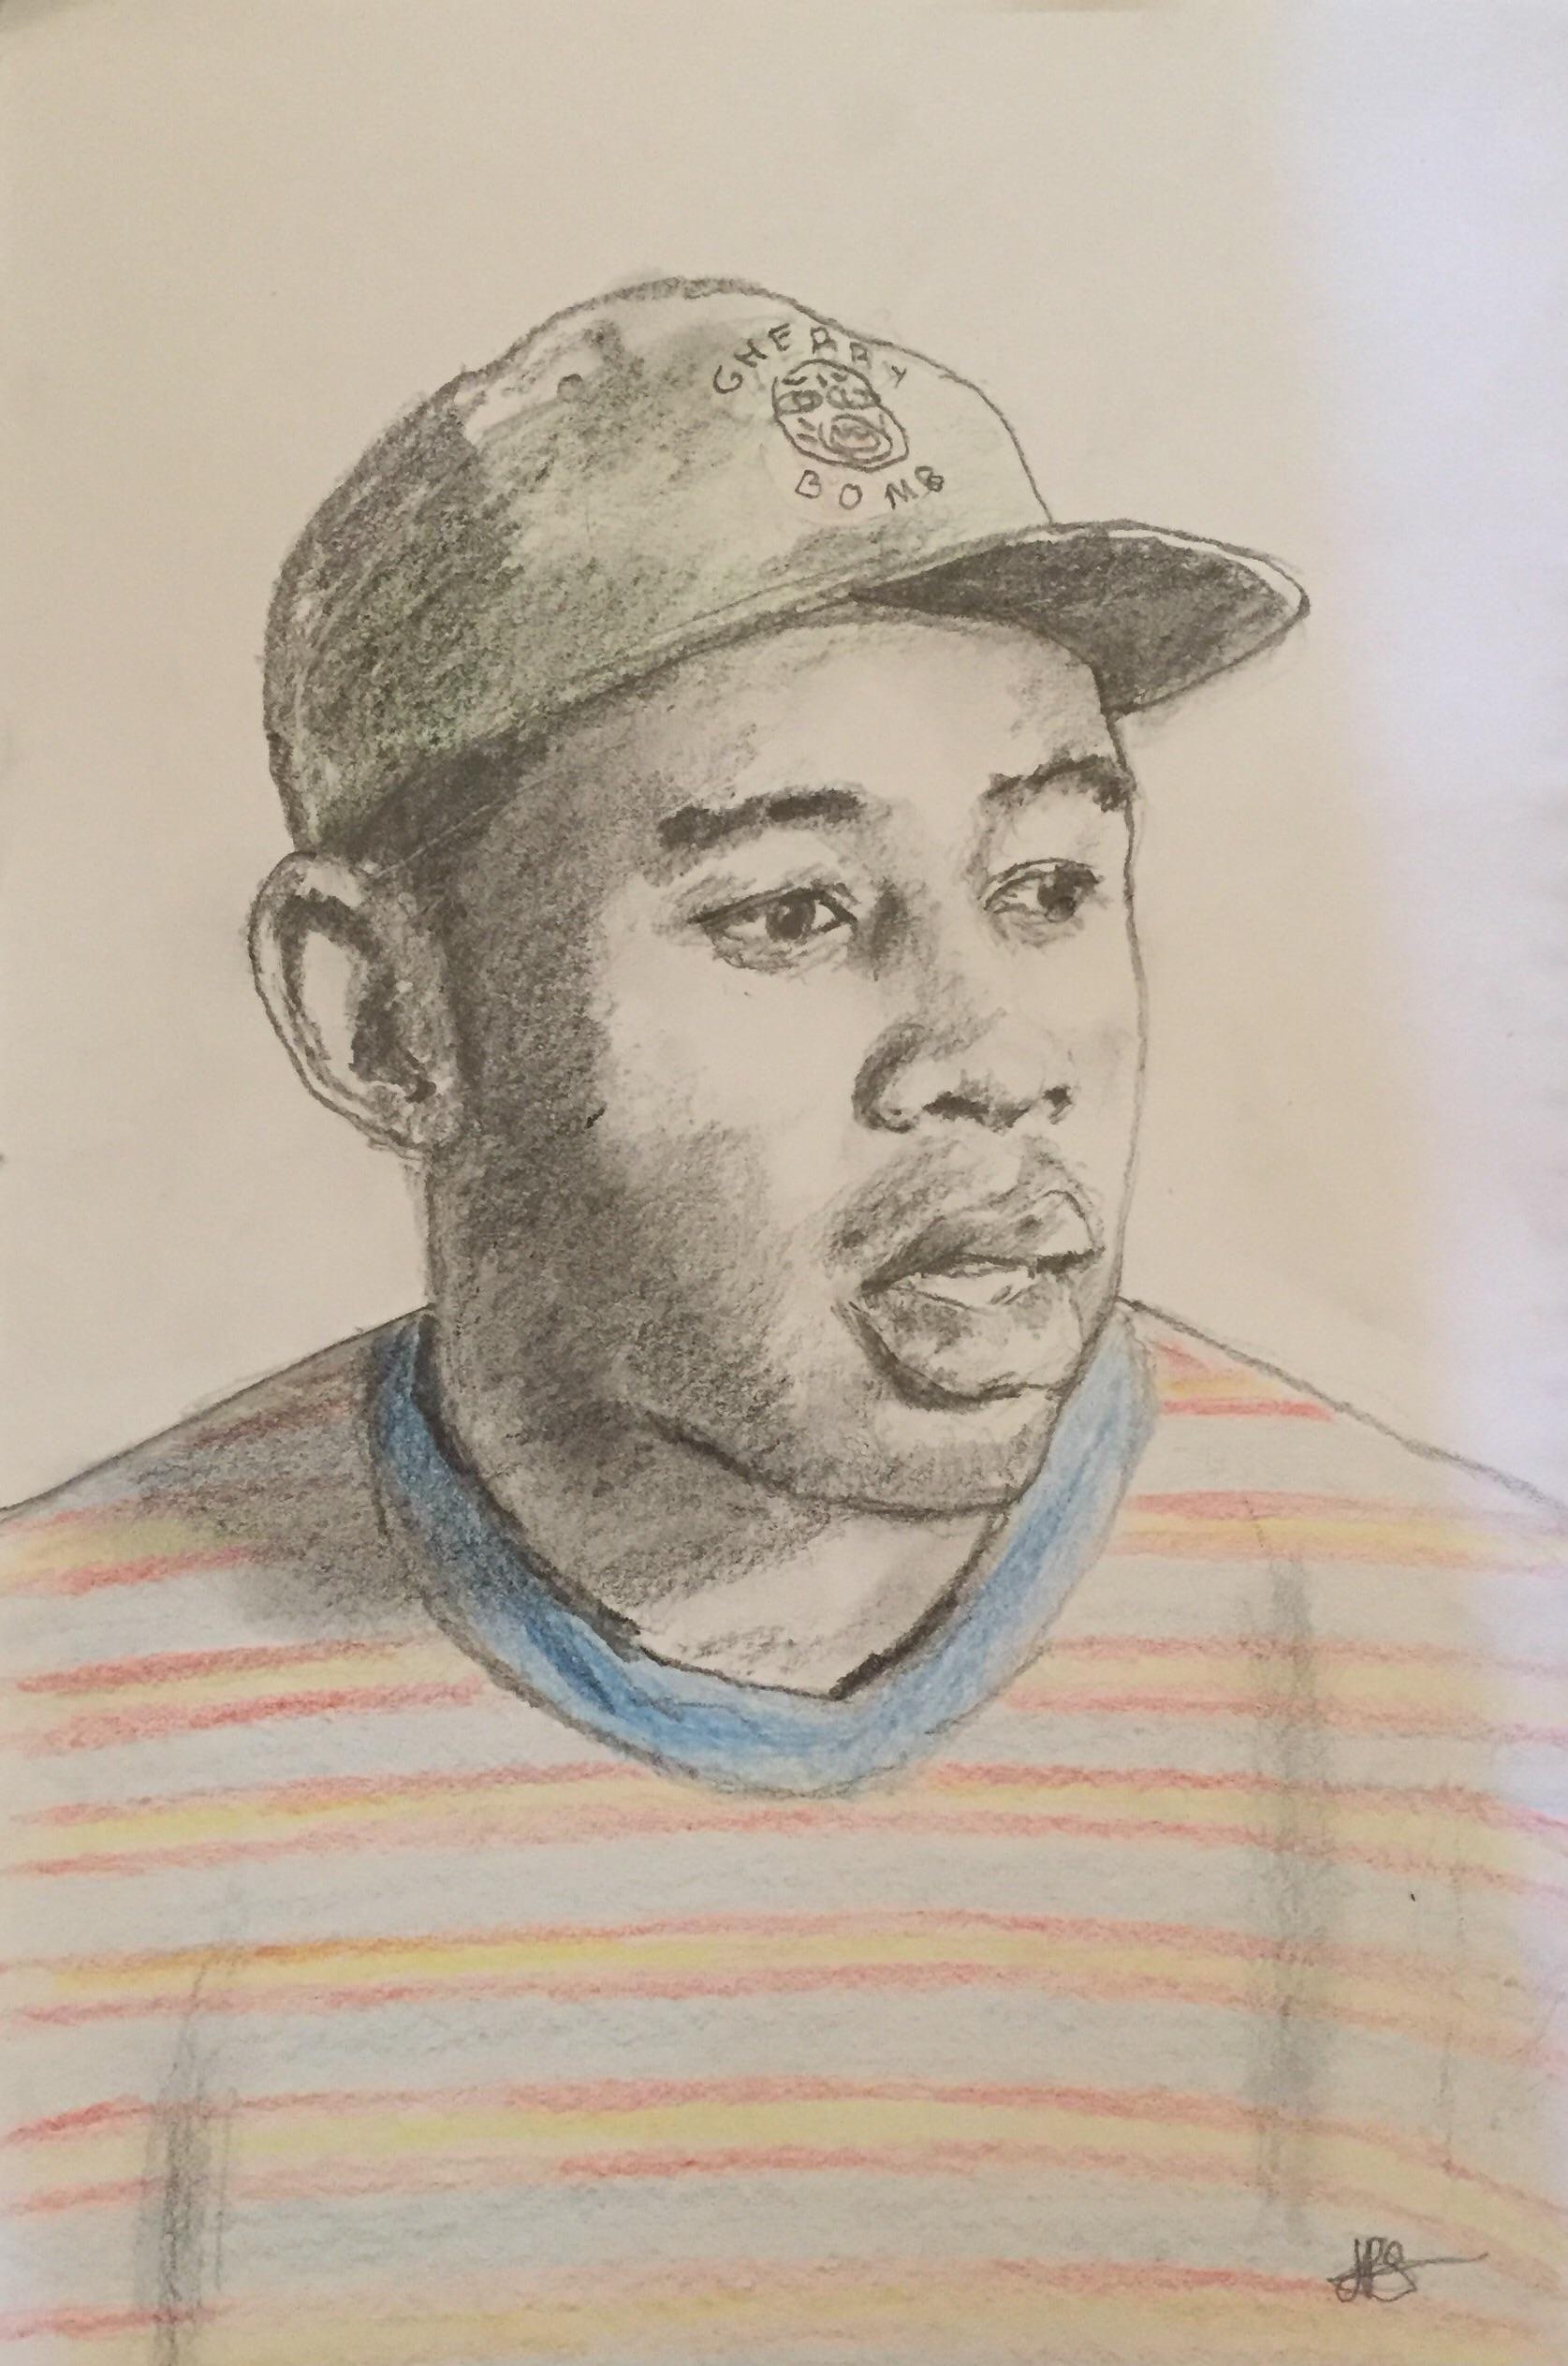 Tyler The Creator Drawing : tyler, creator, drawing, Tyler, Creator, Pencils, 8x12